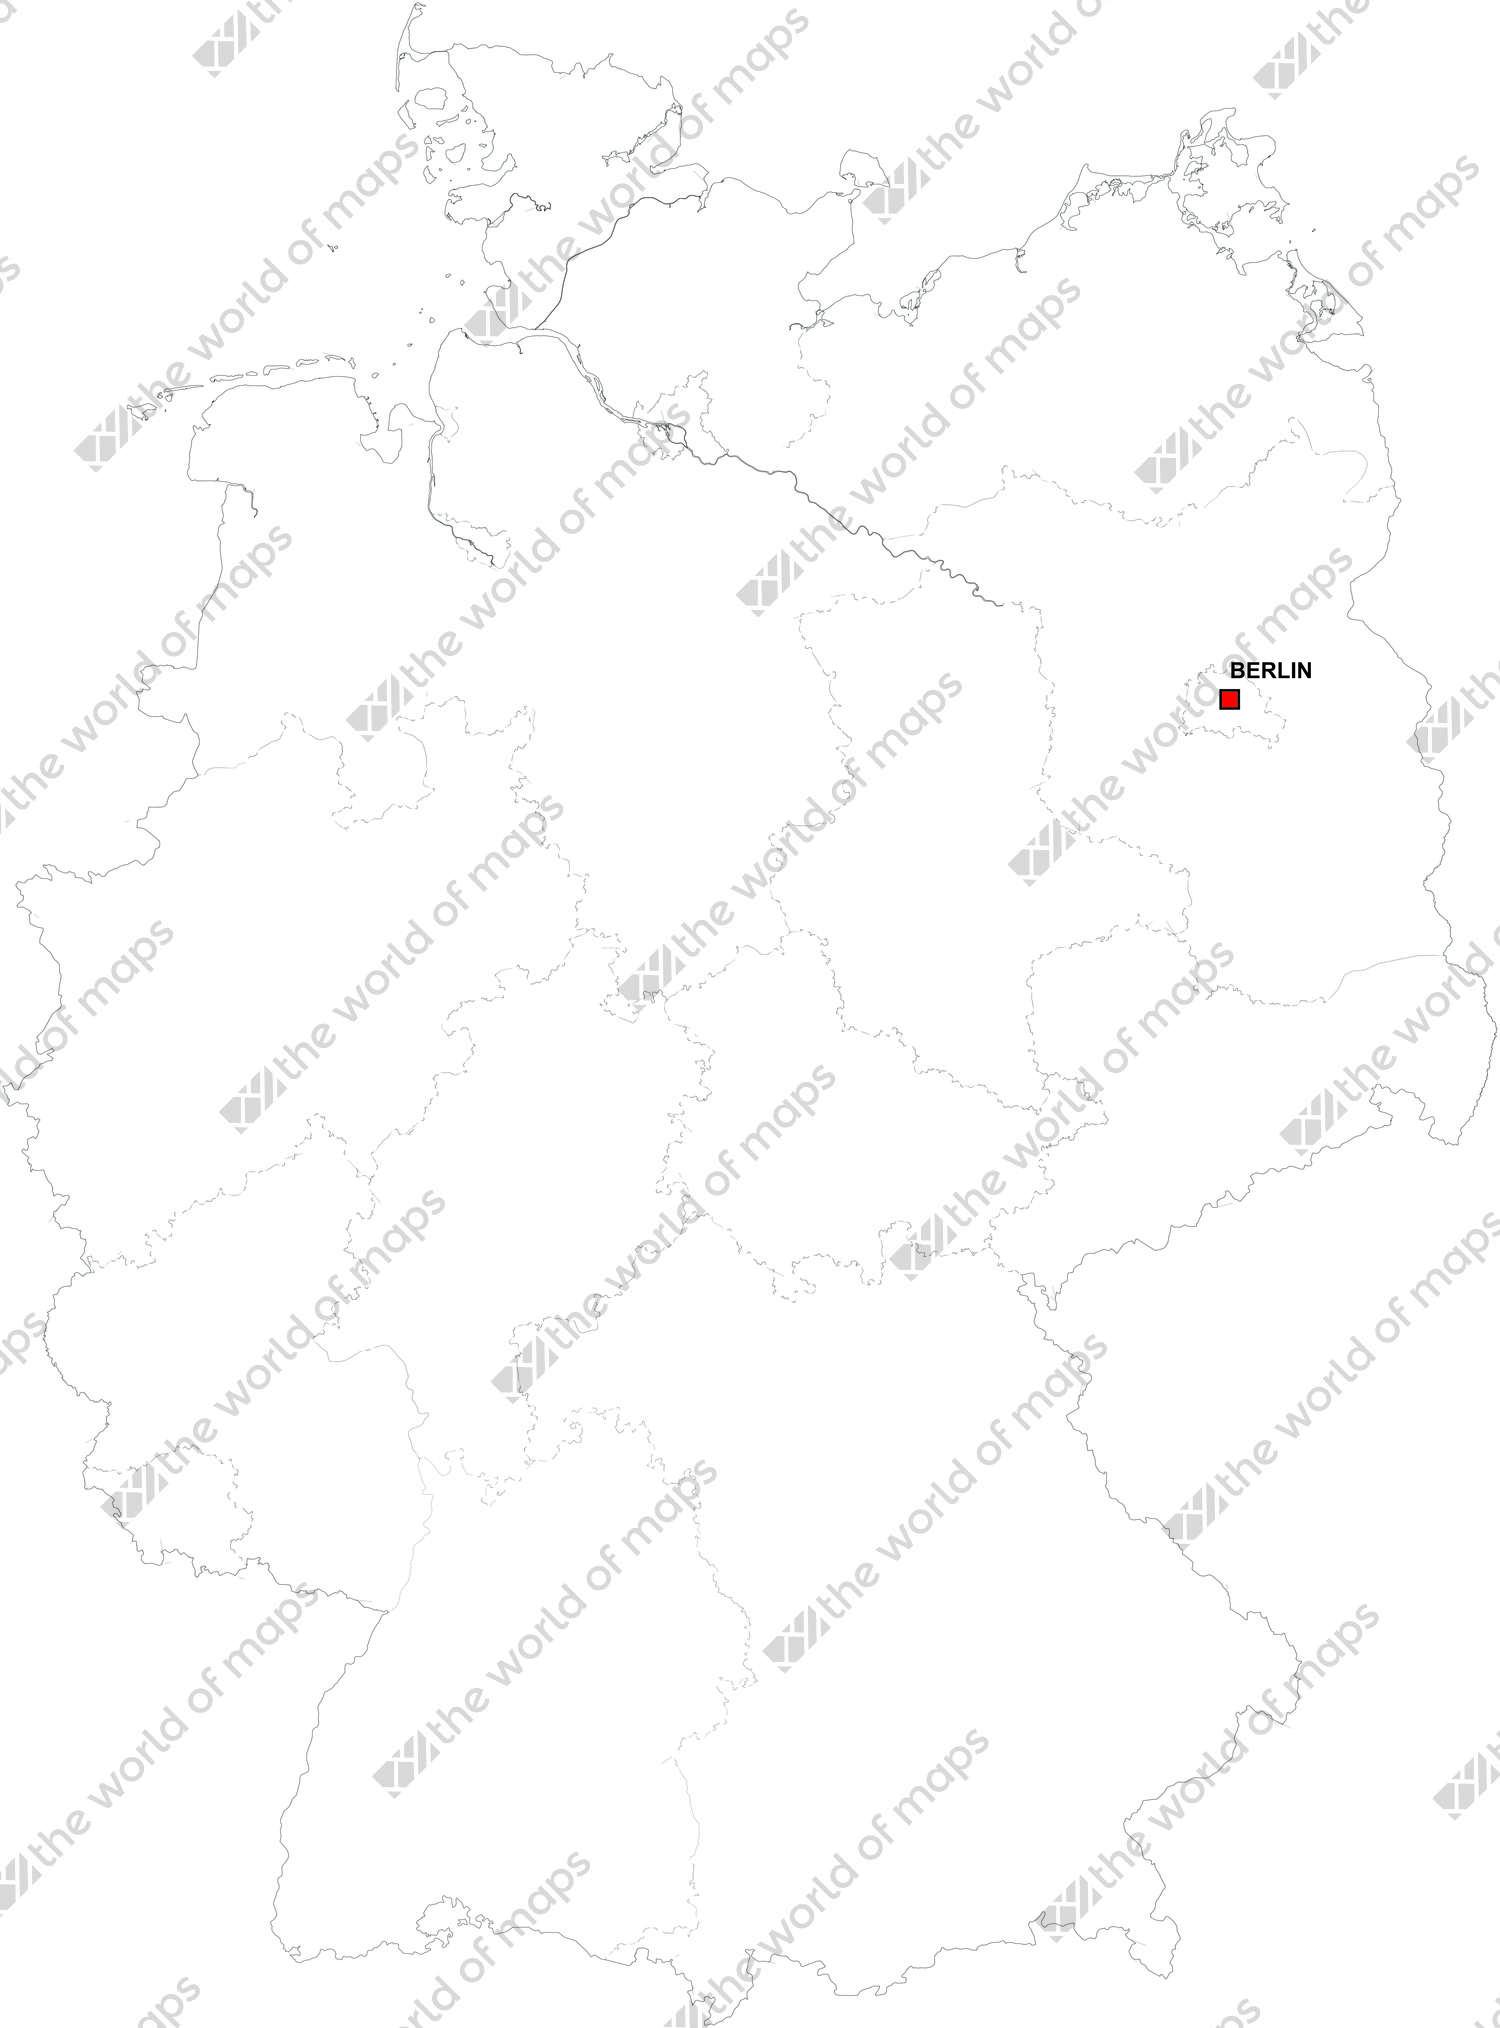 Digital map of Germany (free)